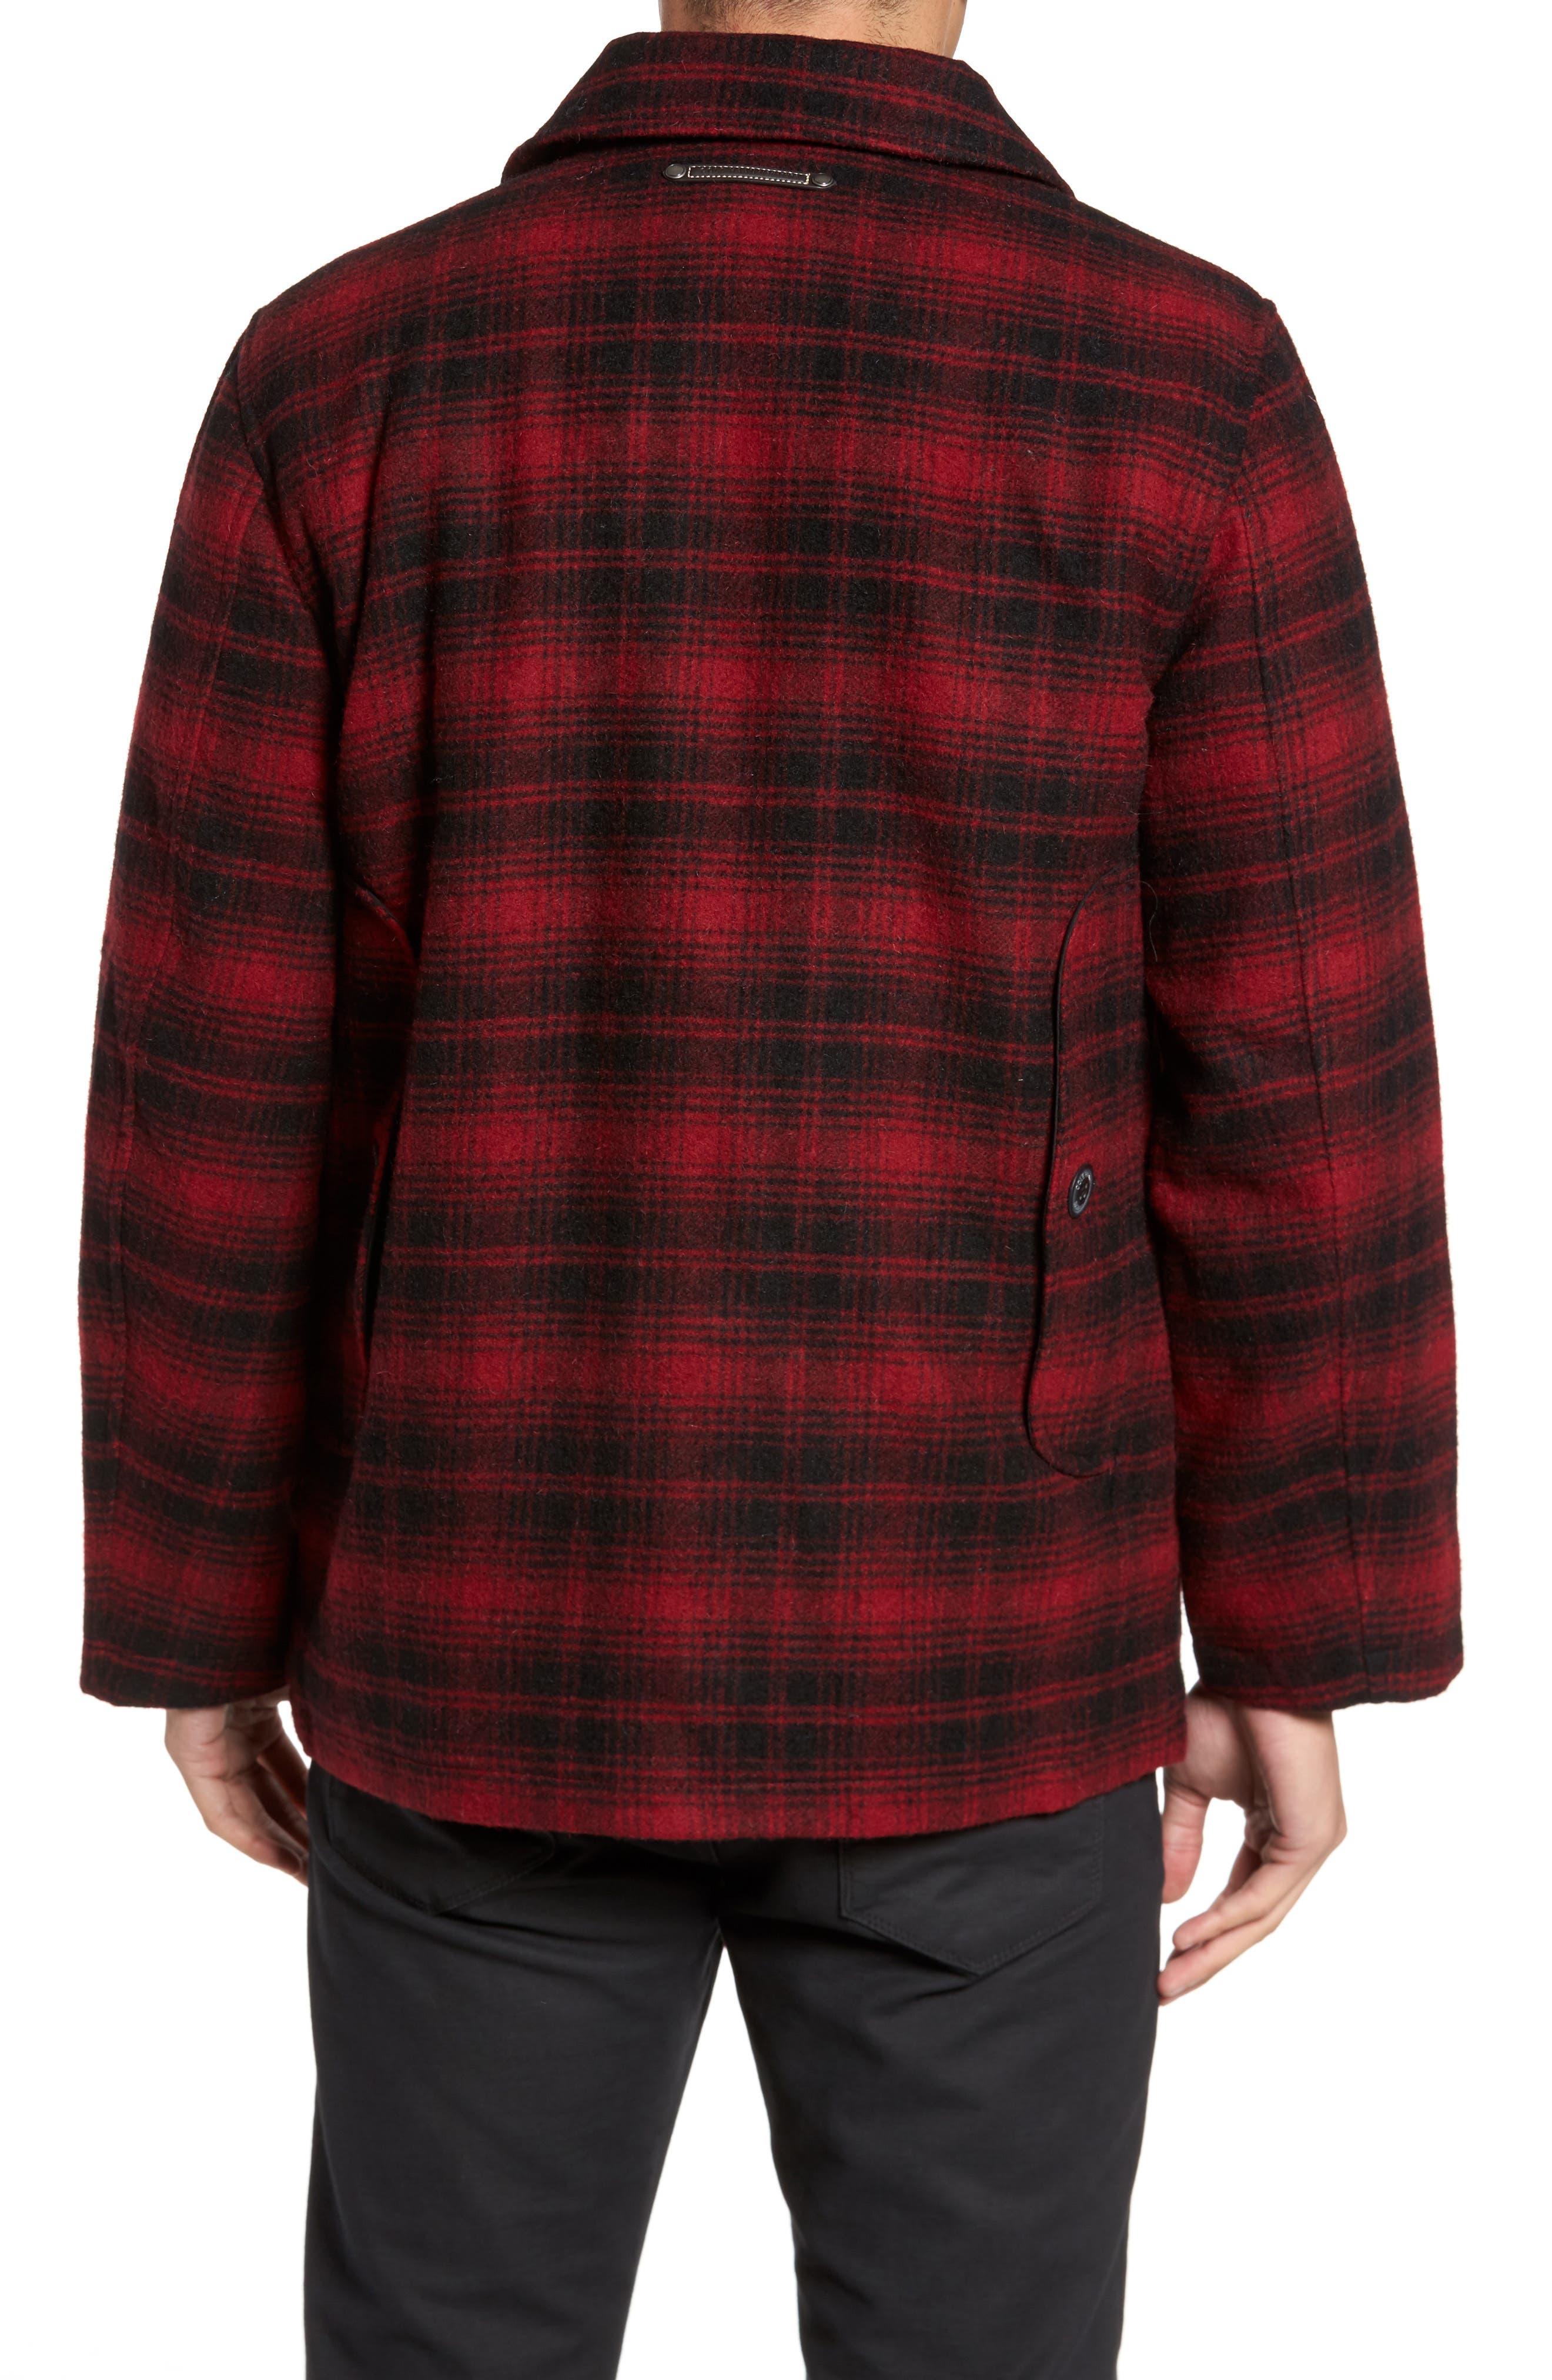 Hunter Jack Wool Blend Shirt Jacket,                             Alternate thumbnail 2, color,                             618